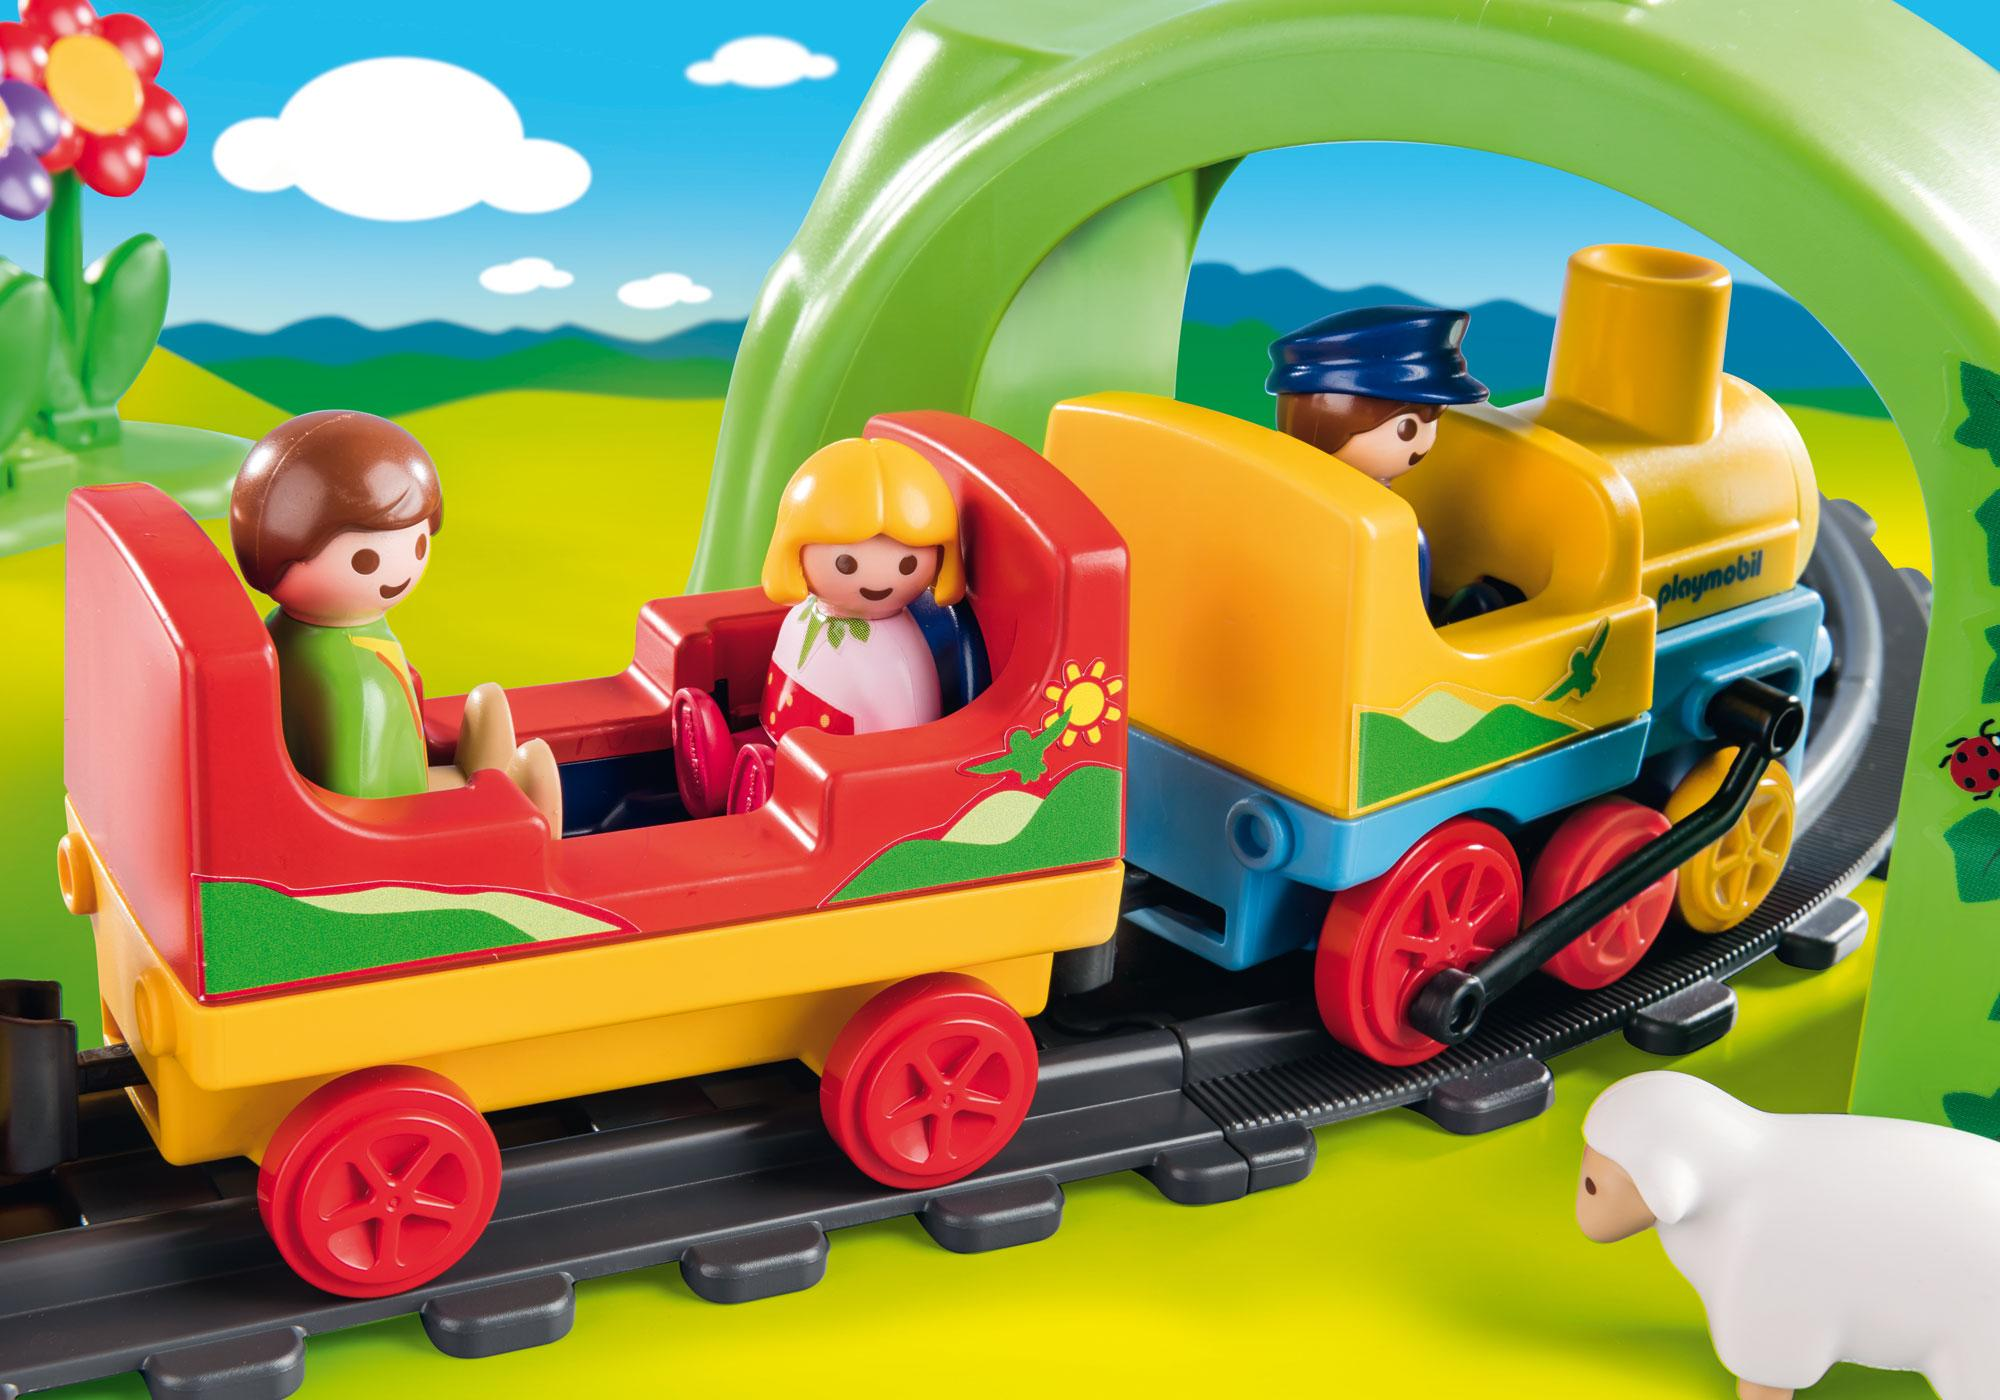 http://media.playmobil.com/i/playmobil/70179_product_extra1/Il mio primo trenino 1.2.3